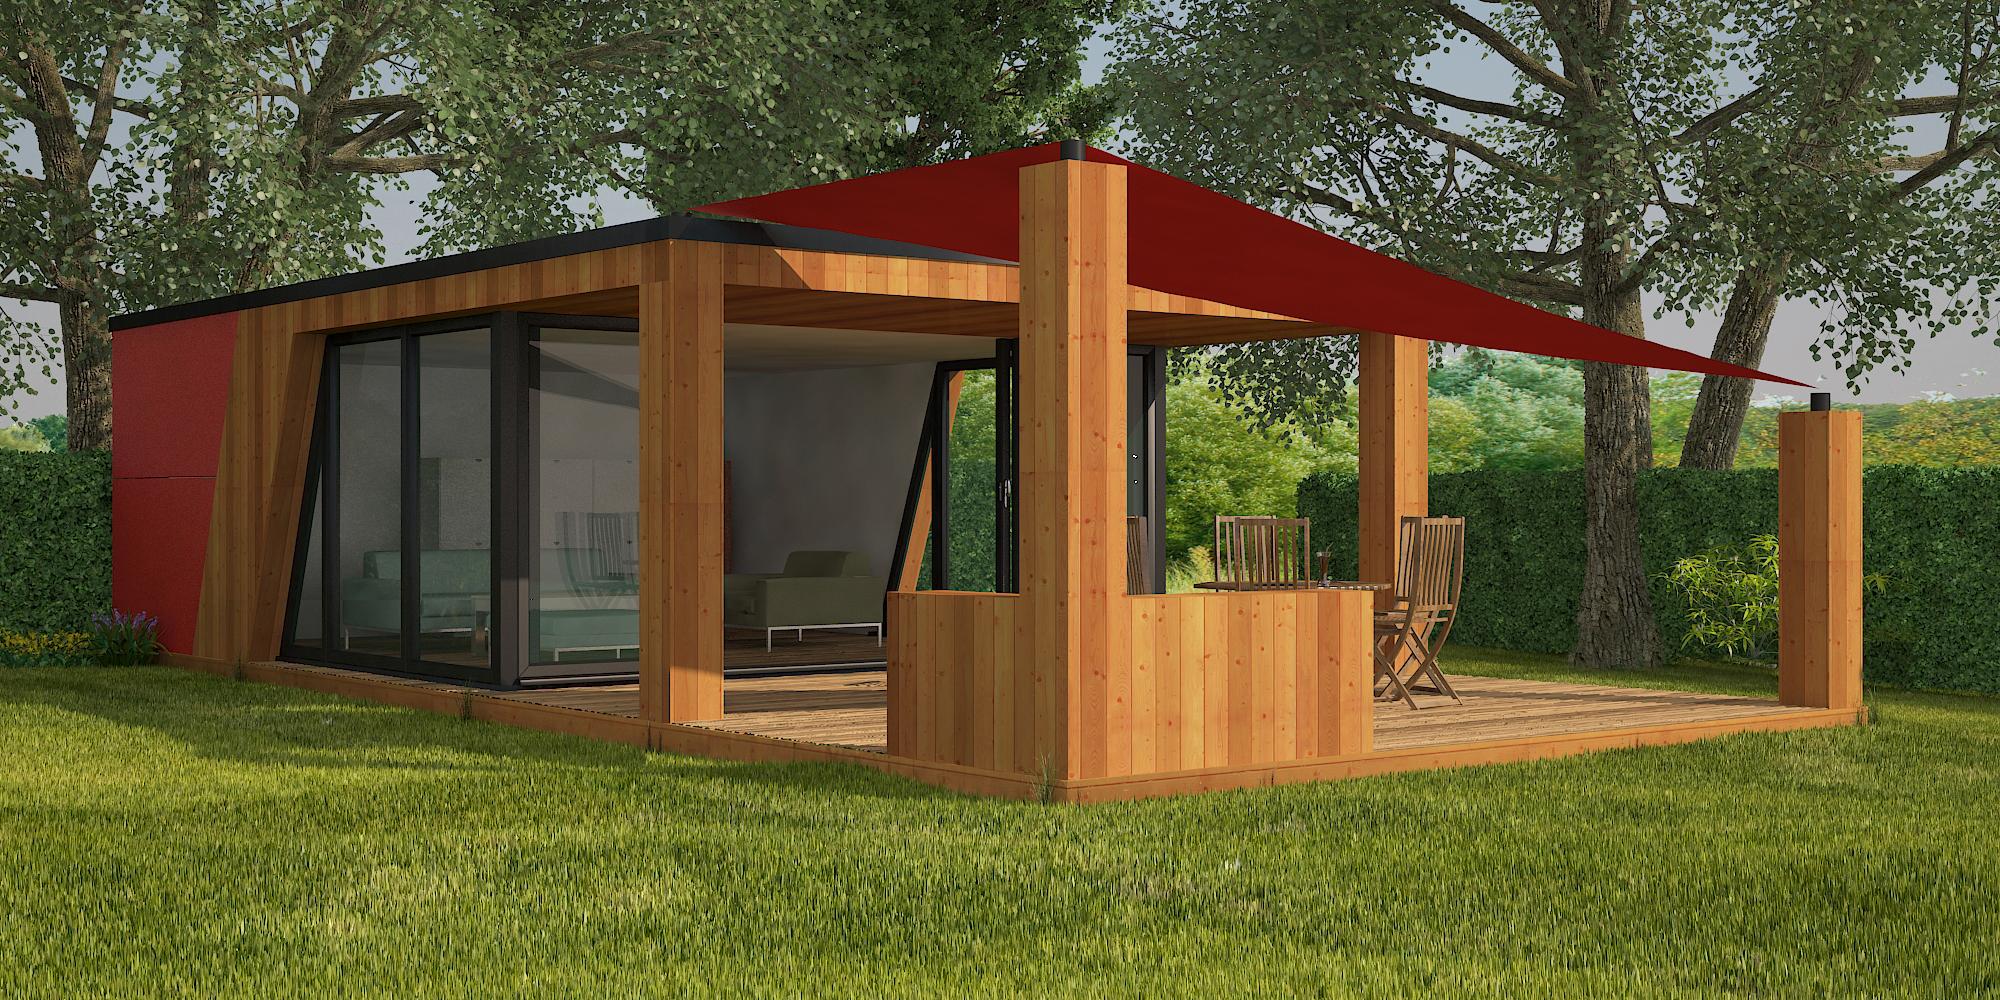 garden rooms, designs, concept image